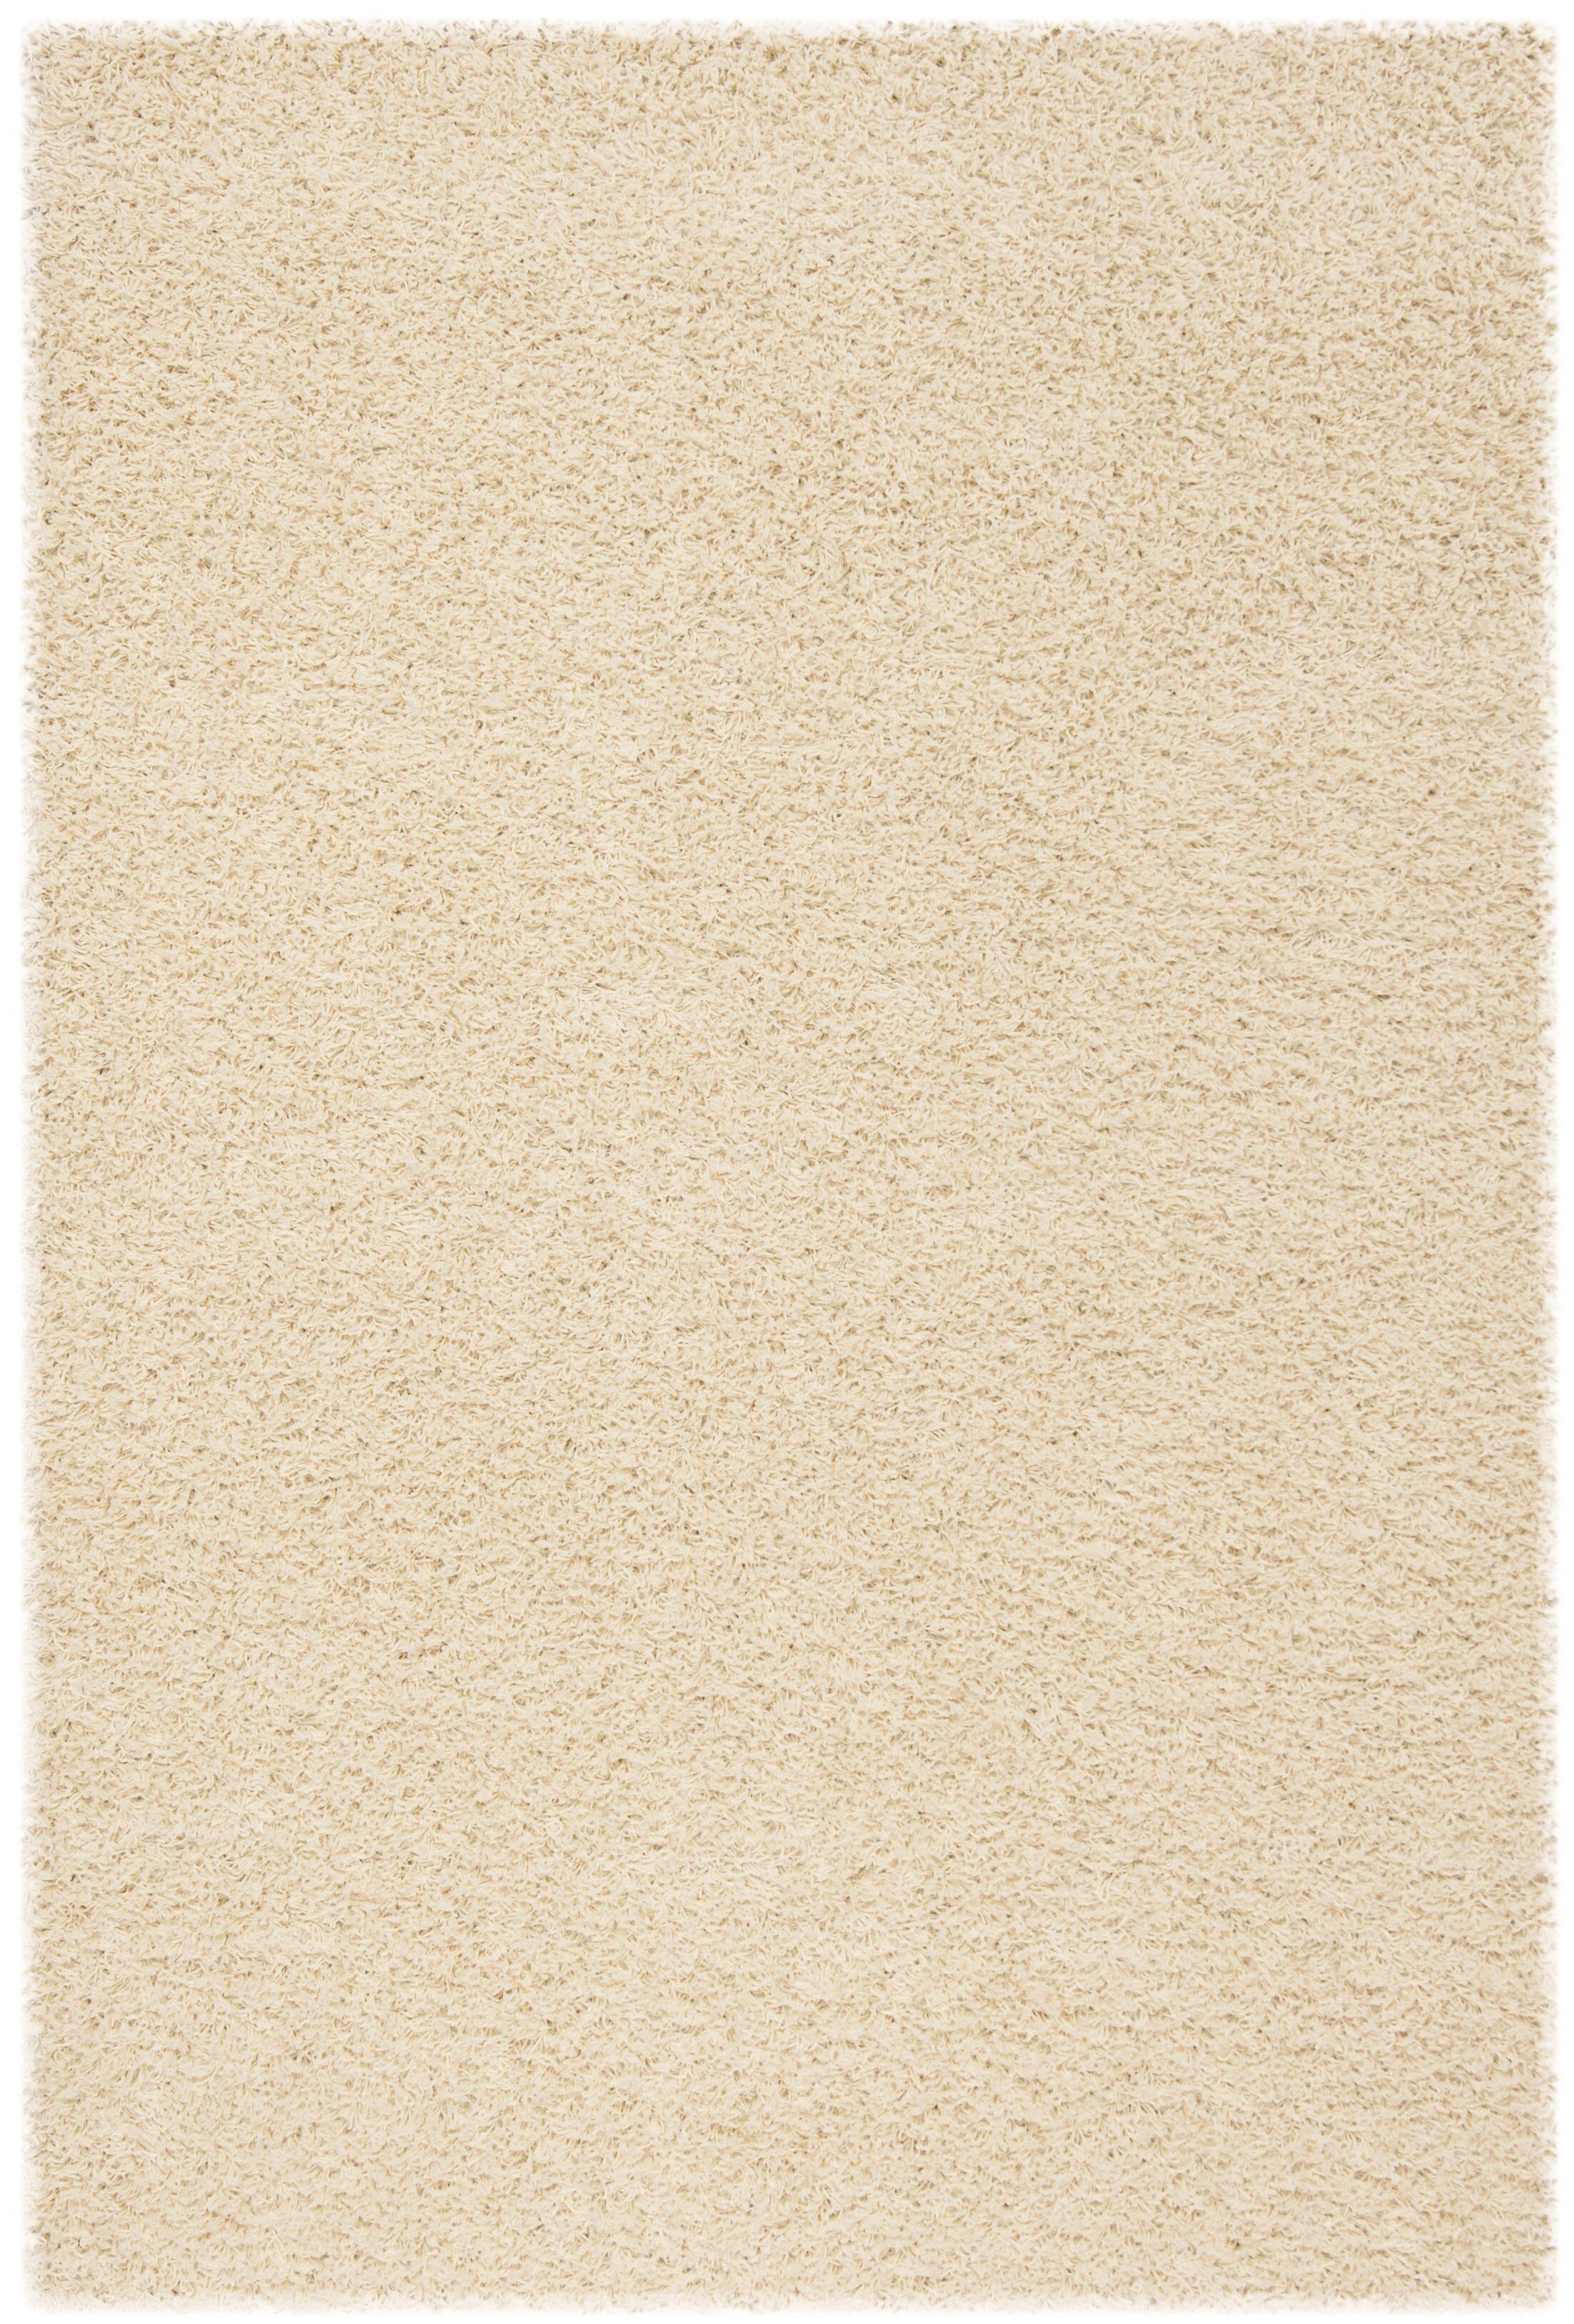 Fornax Shag Ivory Area Rug Rug Size: Rectangle 4' x 6'